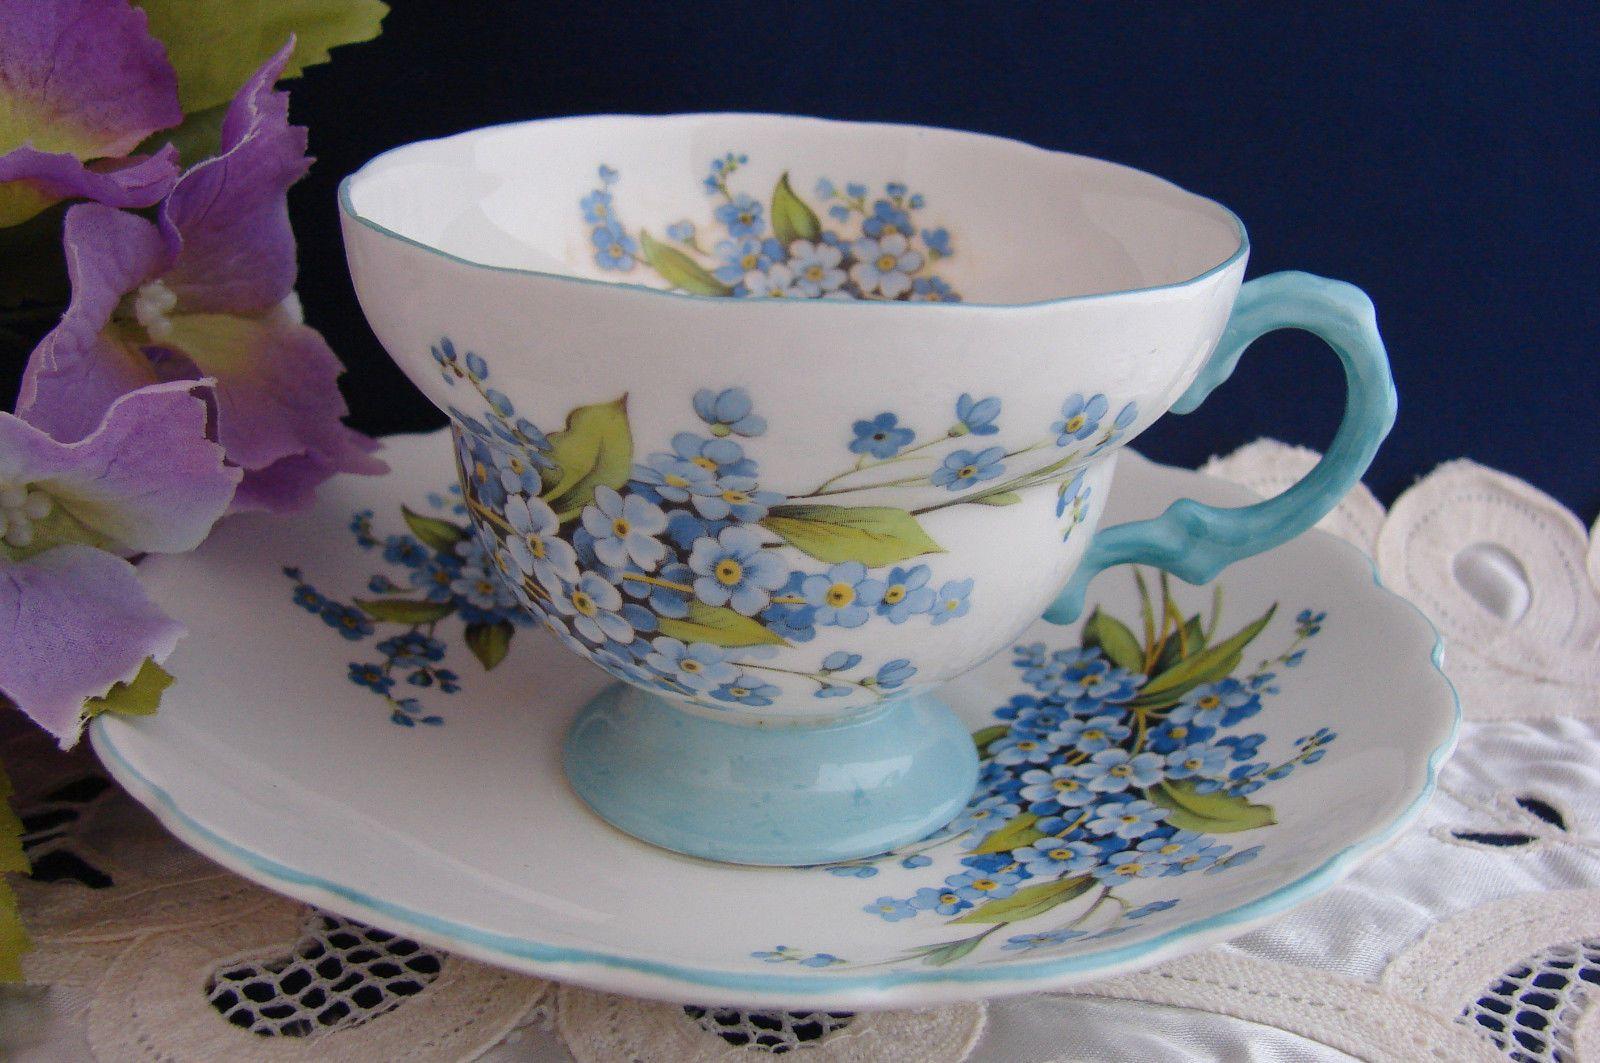 Rosina English Bone China Blue Floral Teacup and Saucer